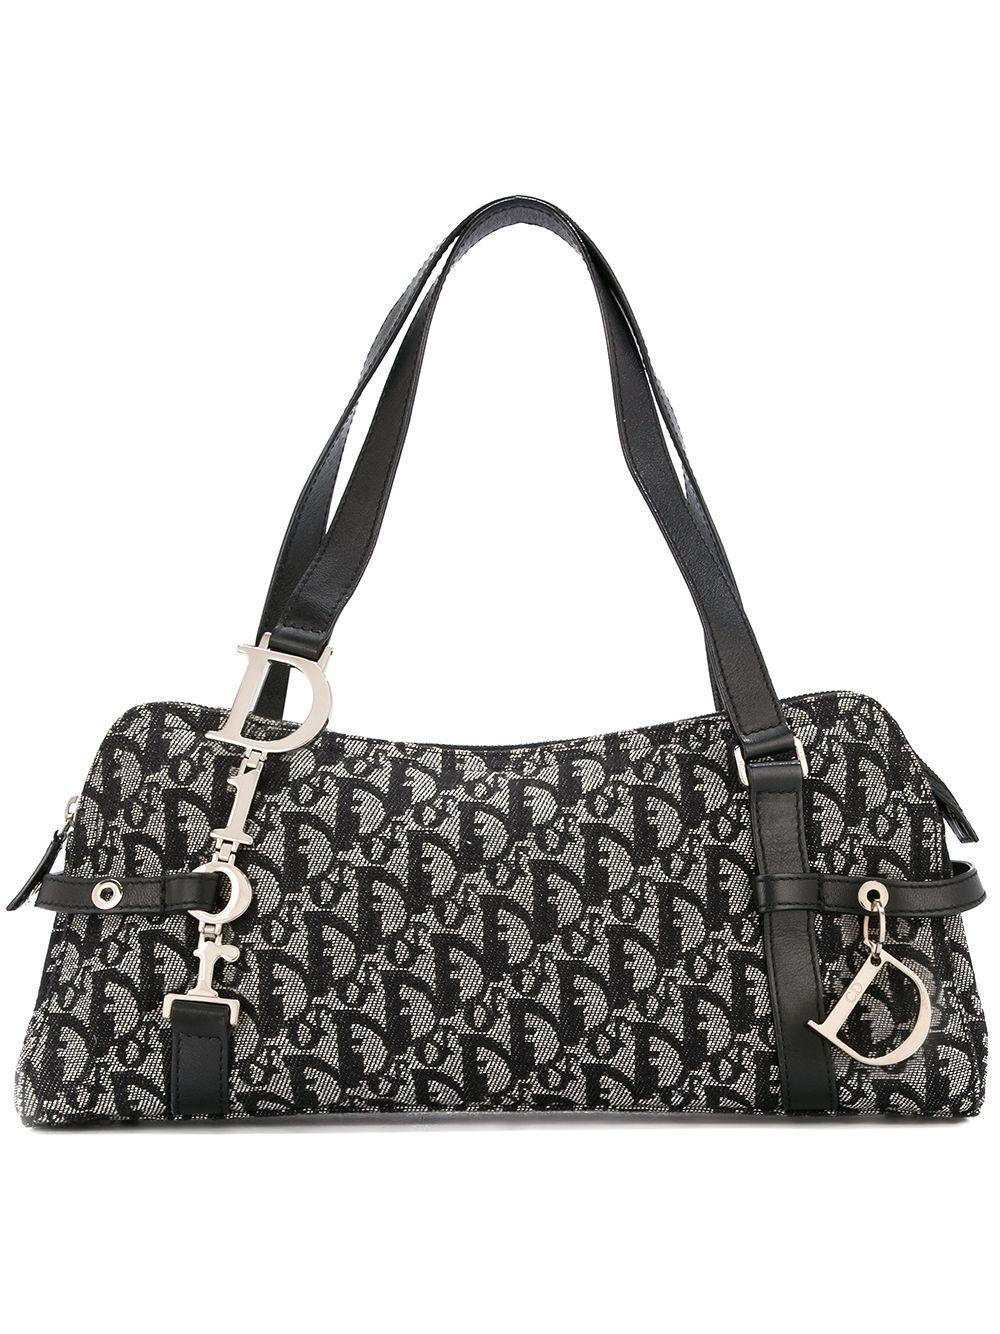 7a99c2f93 Dior Christian Vintage Trotter Hand Bag - Black | ModeSens